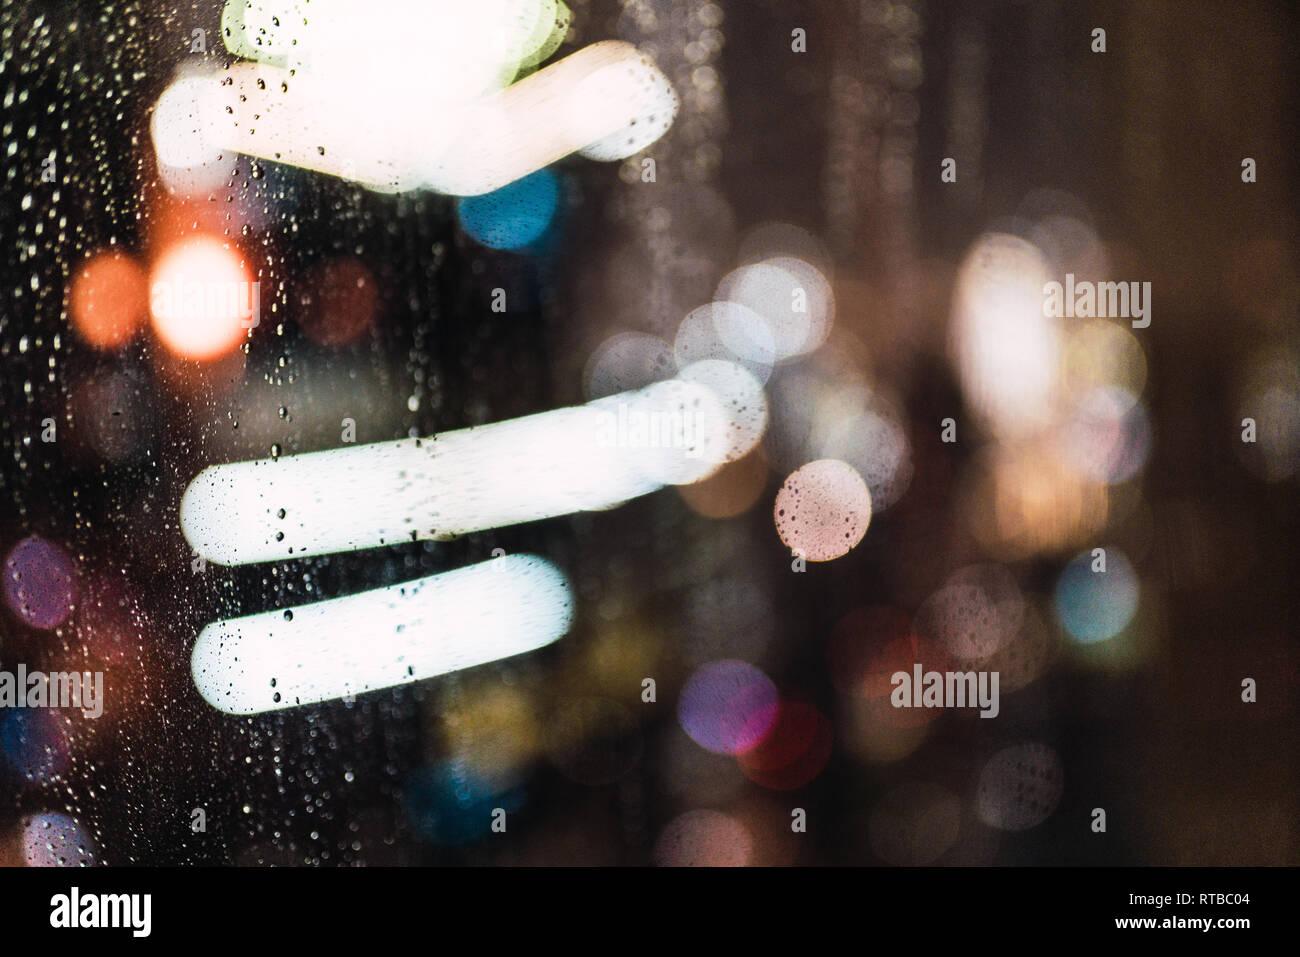 Night city through wet glass - Stock Image